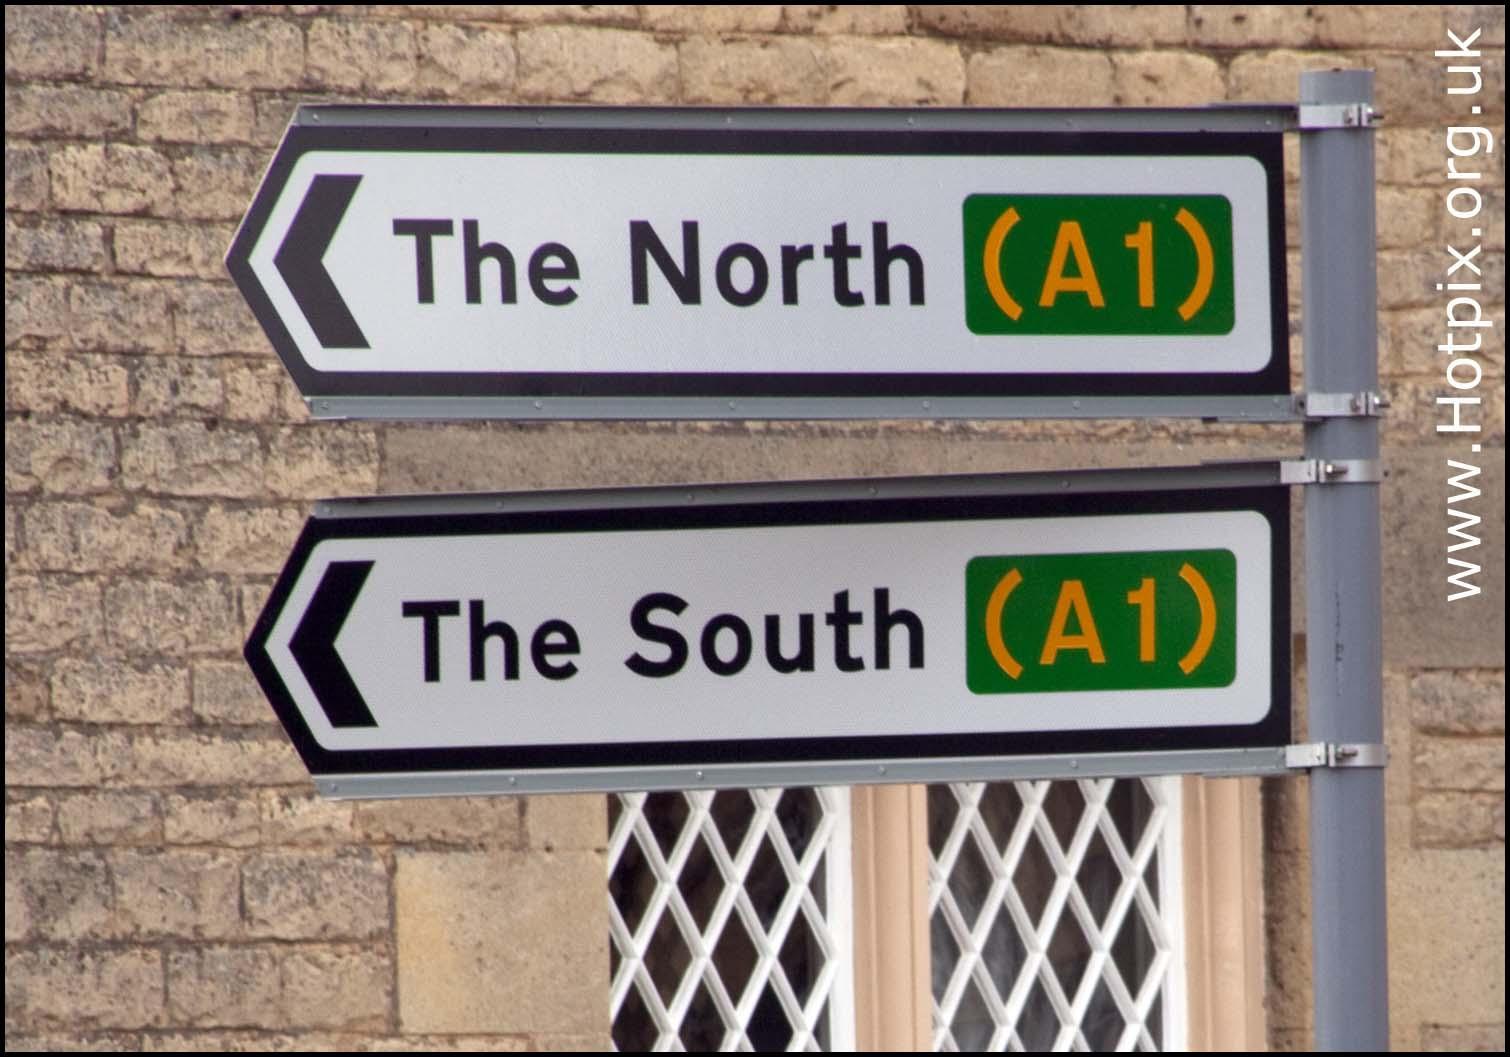 A1,north,south,sign,signs,england,cambridgeshire,peterboro,peterborough,road,highway,wansford,wanford,UK,GB,britain,united,kingdom,narrative,hotpix!,Edinburg,edimburgh